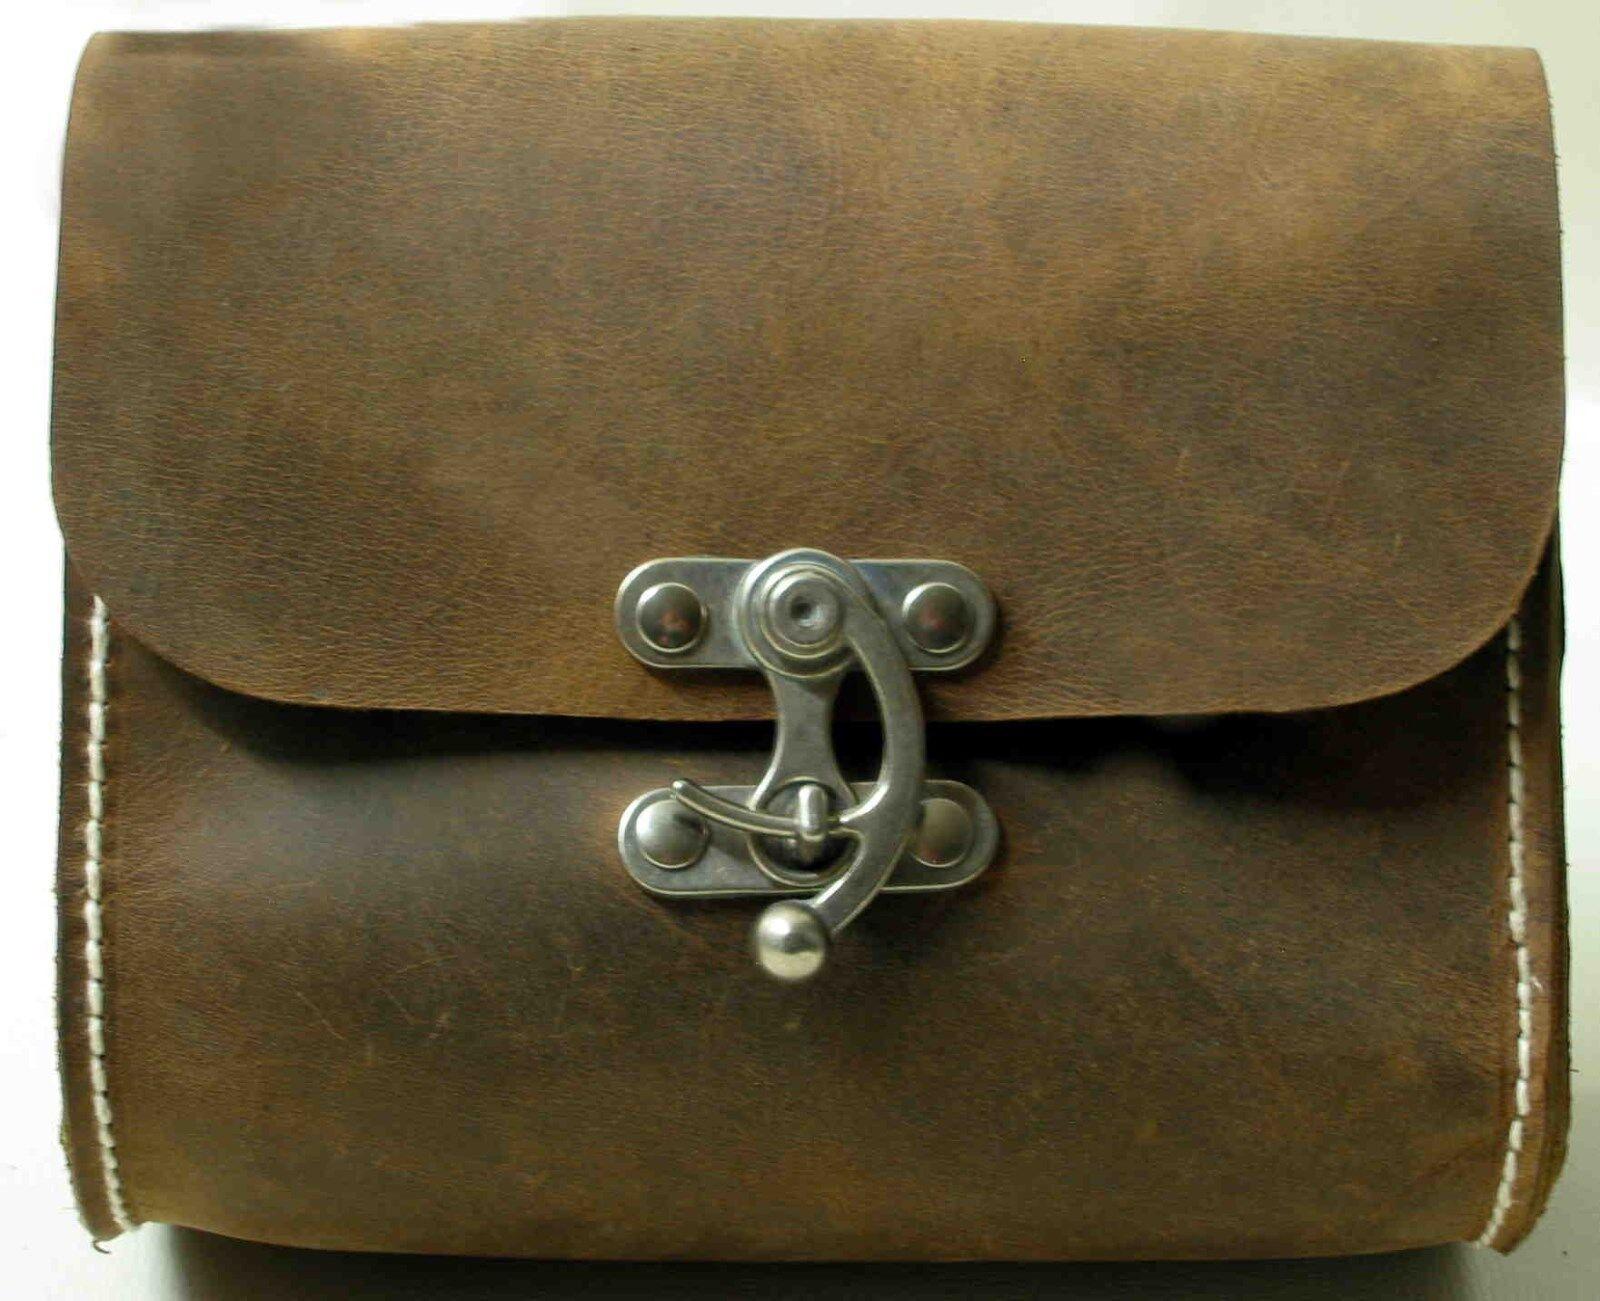 1A SATTLERARBEIT Vintagetasche TOP Handtasche BÜFFELLEDER BÜFFELLEDER BÜFFELLEDER Schultertasche NEU Kl | Luxus  88e553